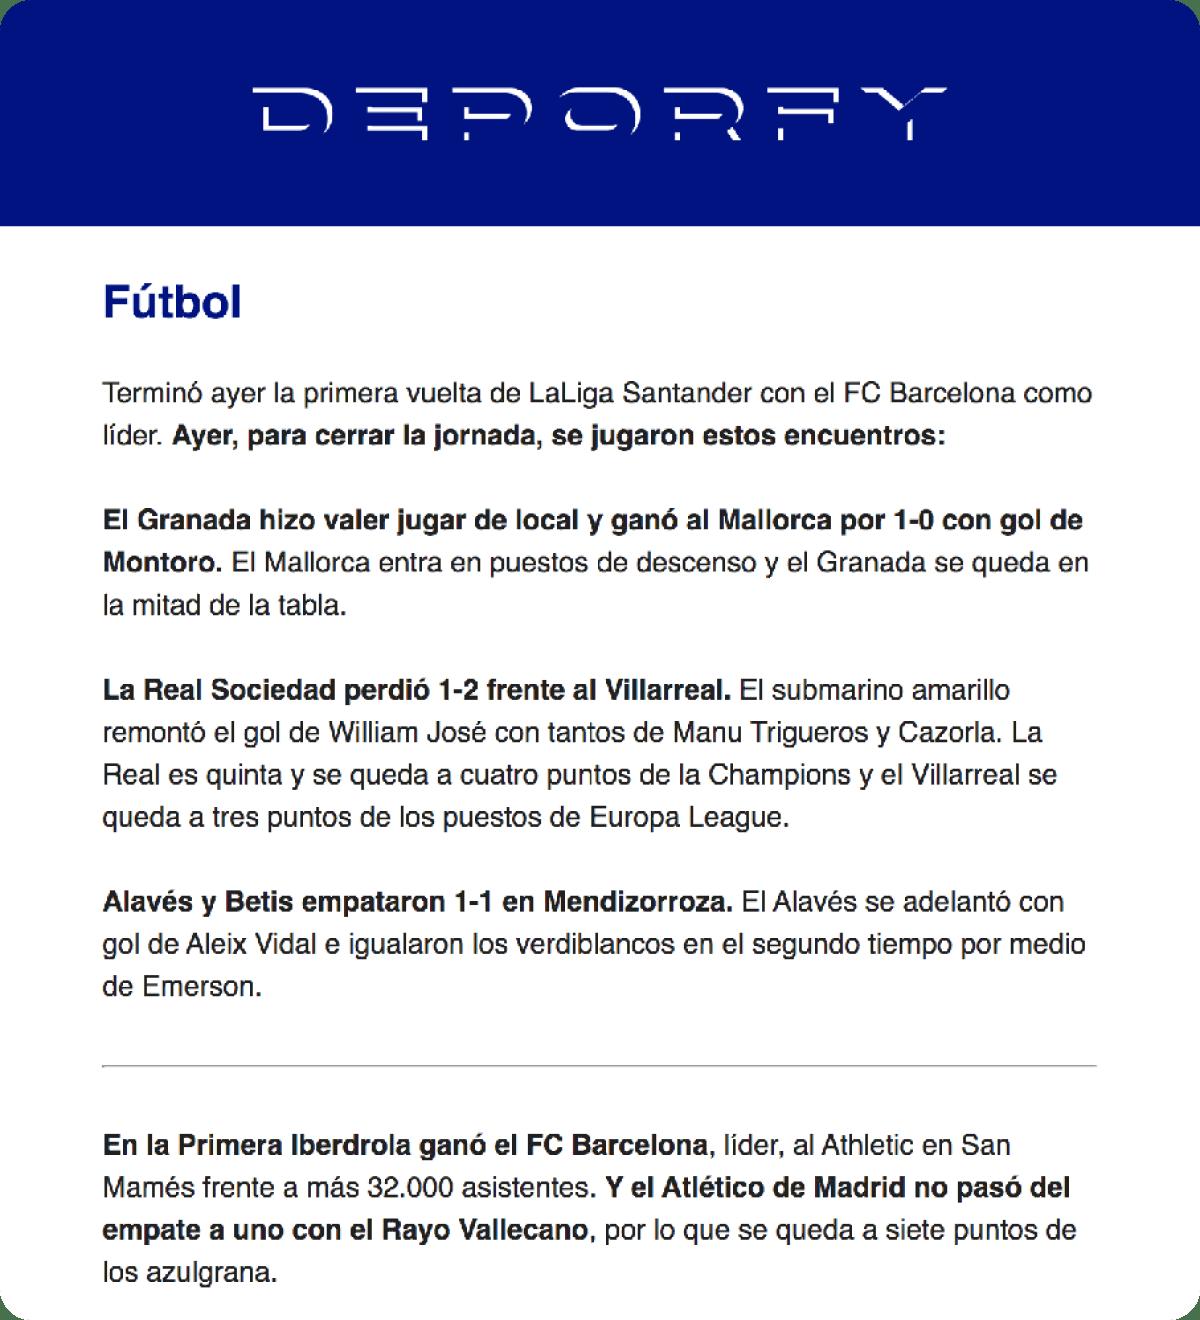 Deporfy newsletter screenshots